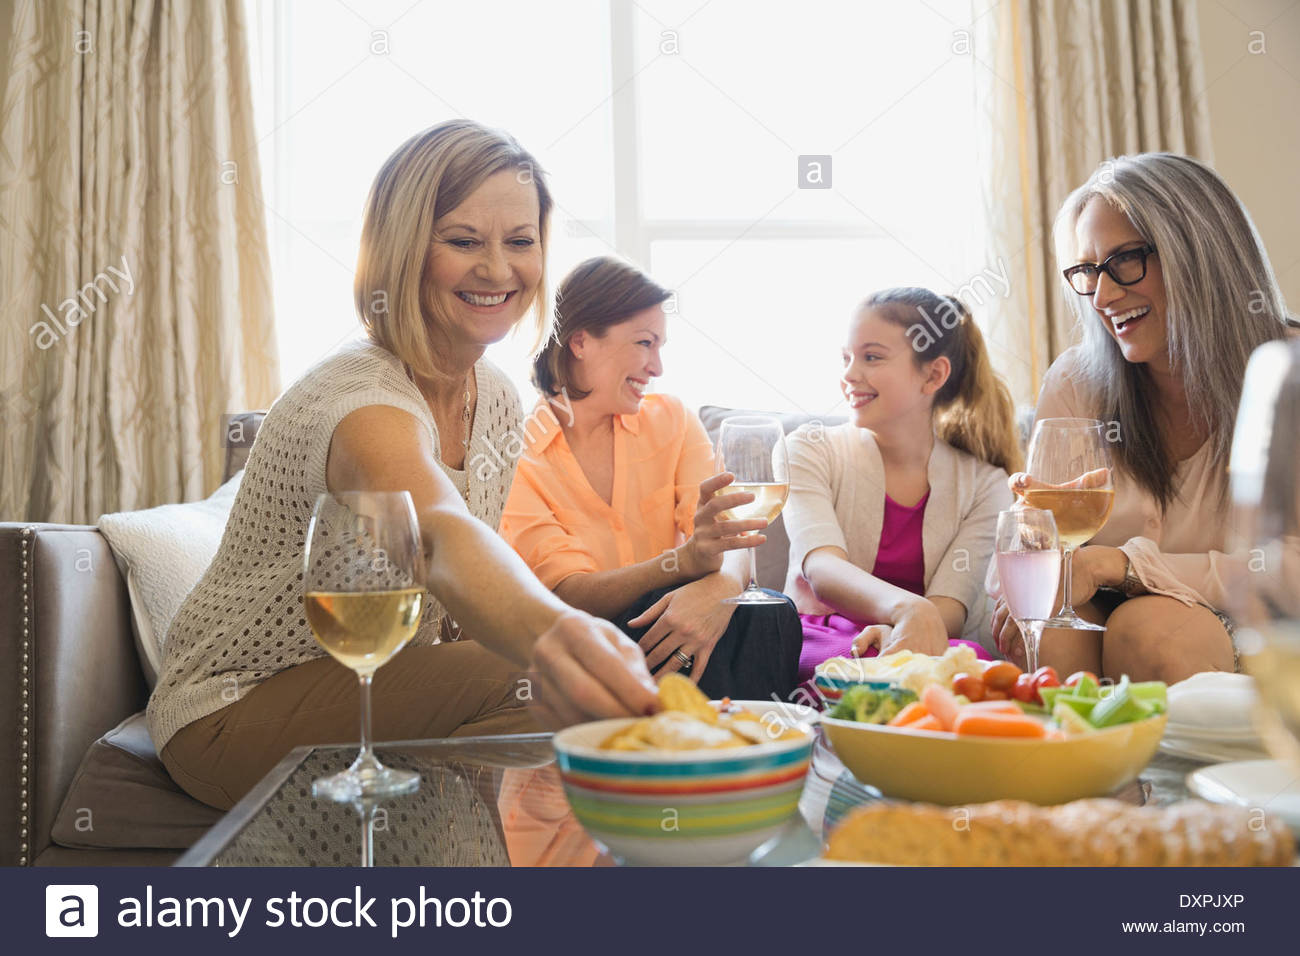 Three generation female enjoying party at home - Stock Image